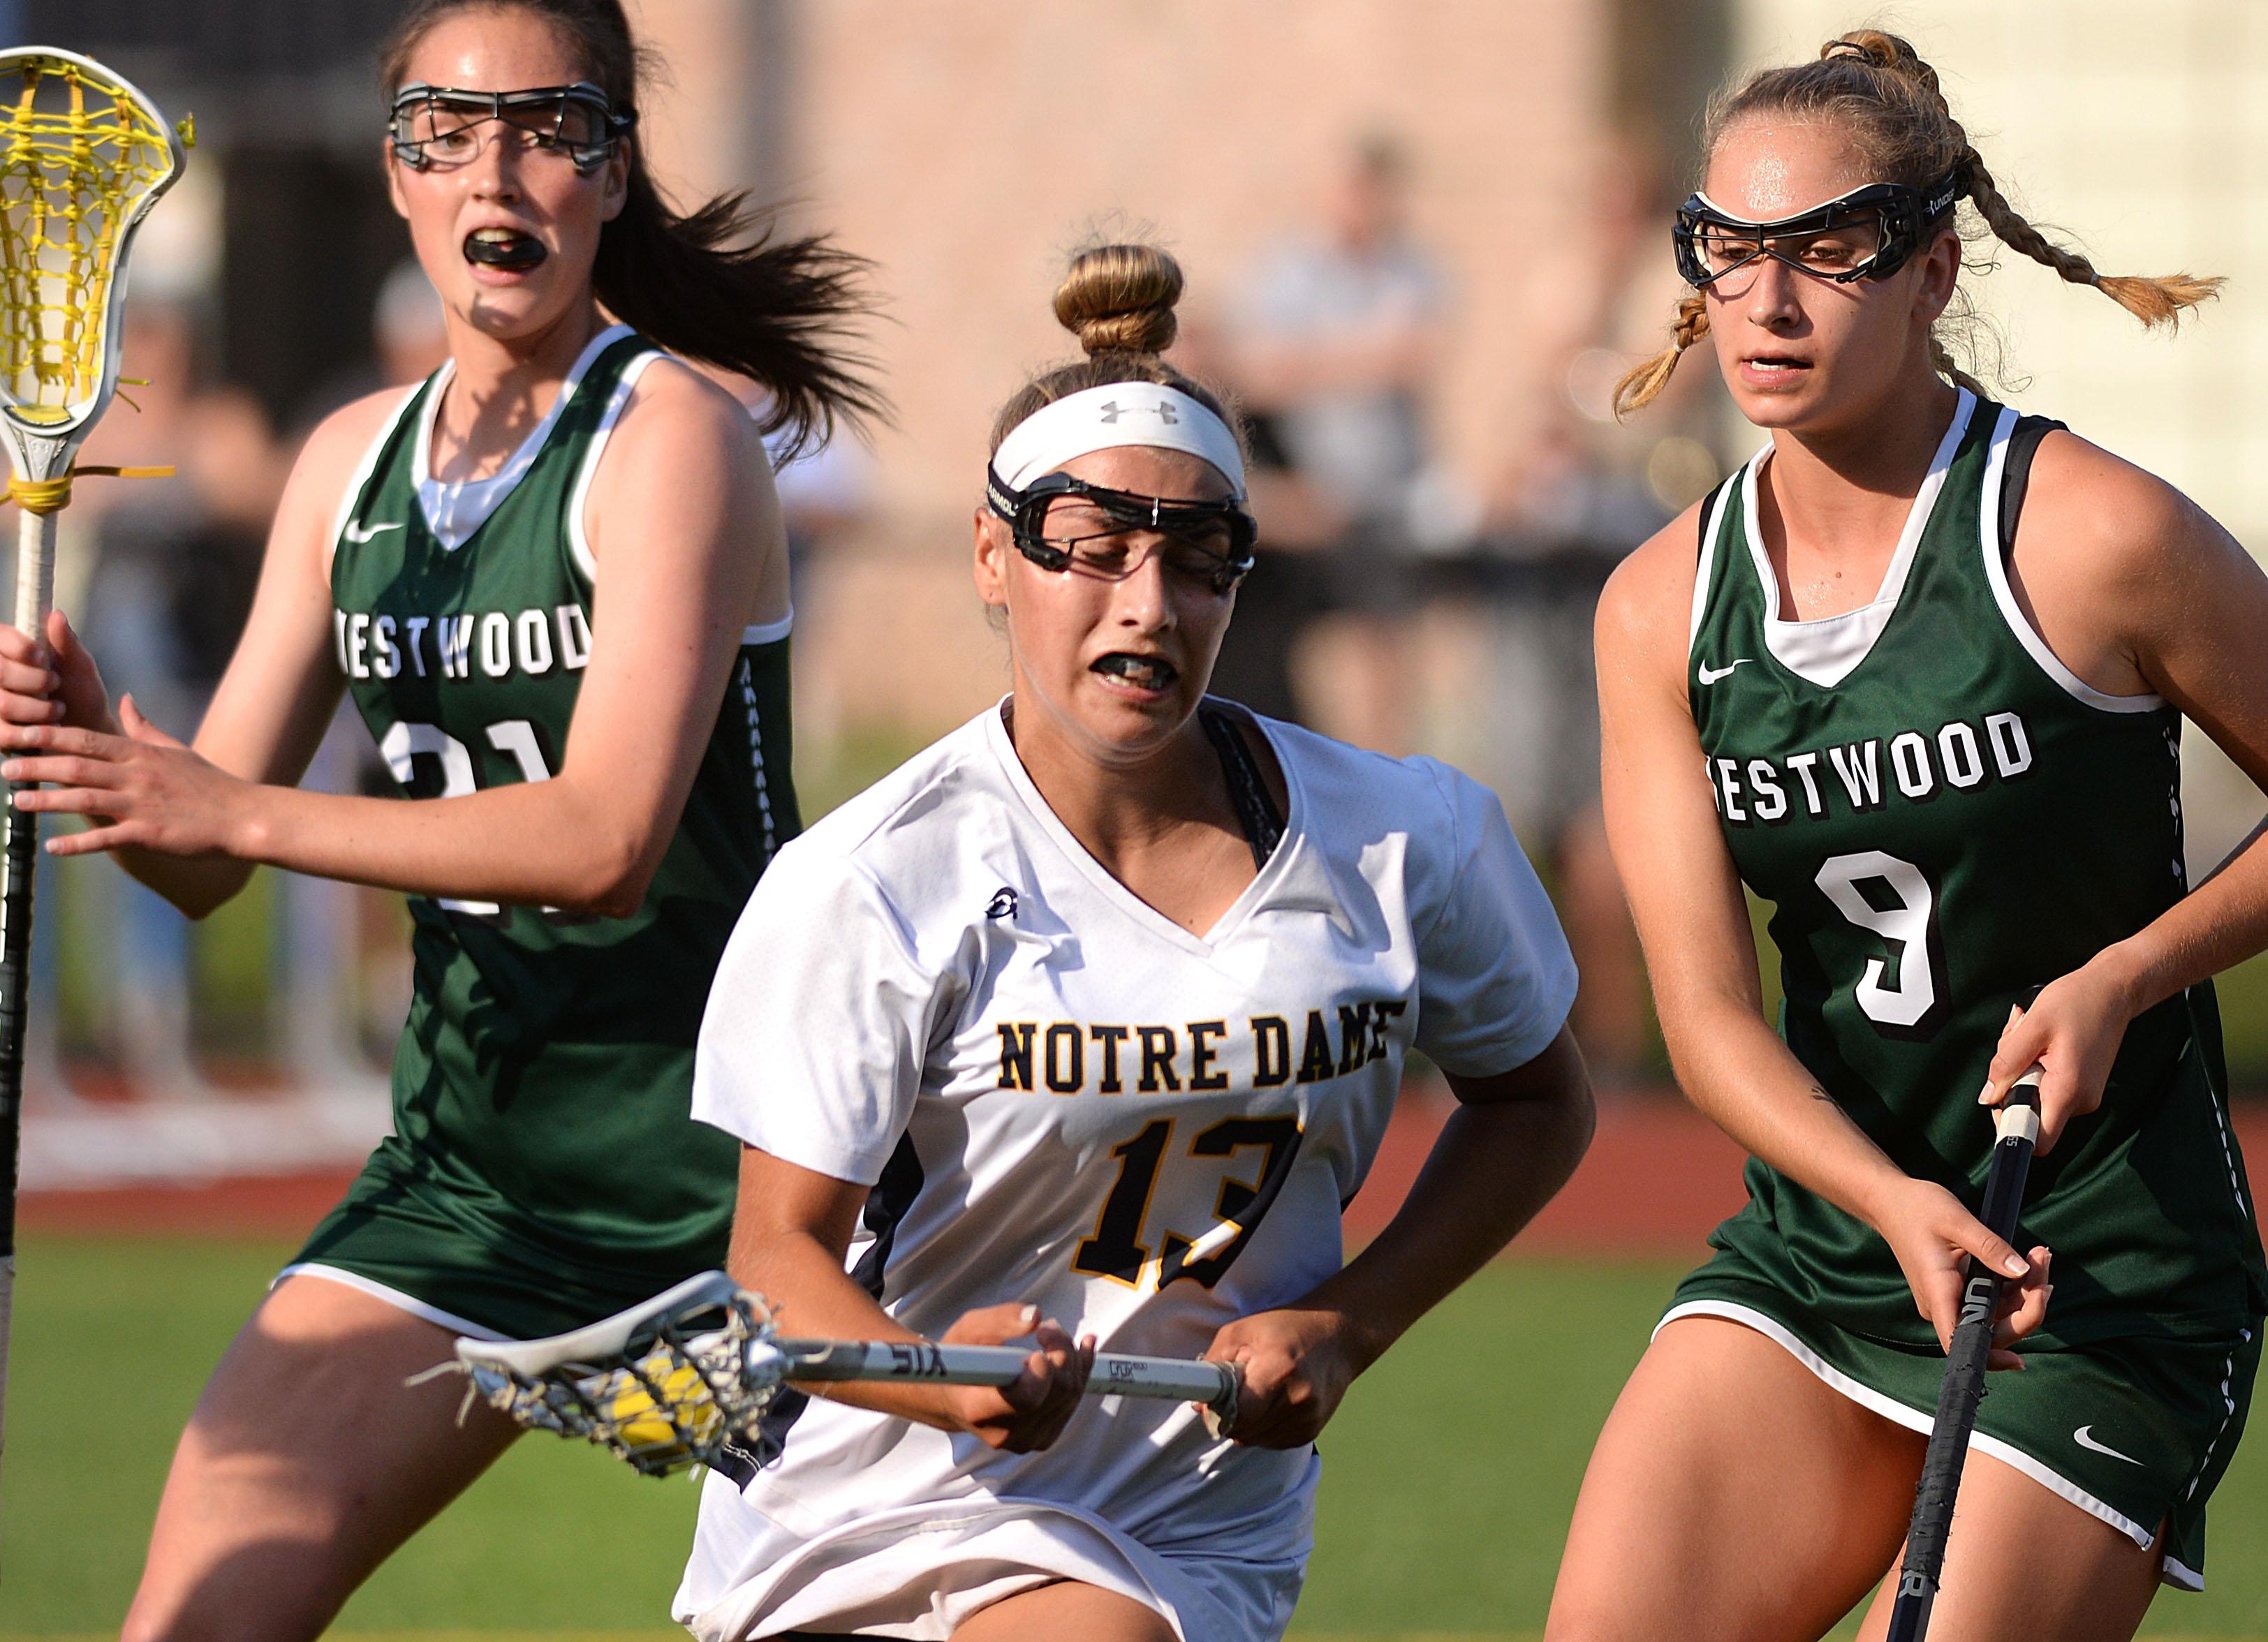 Westwood girls lacrosse gets small revenge on Notre Dame